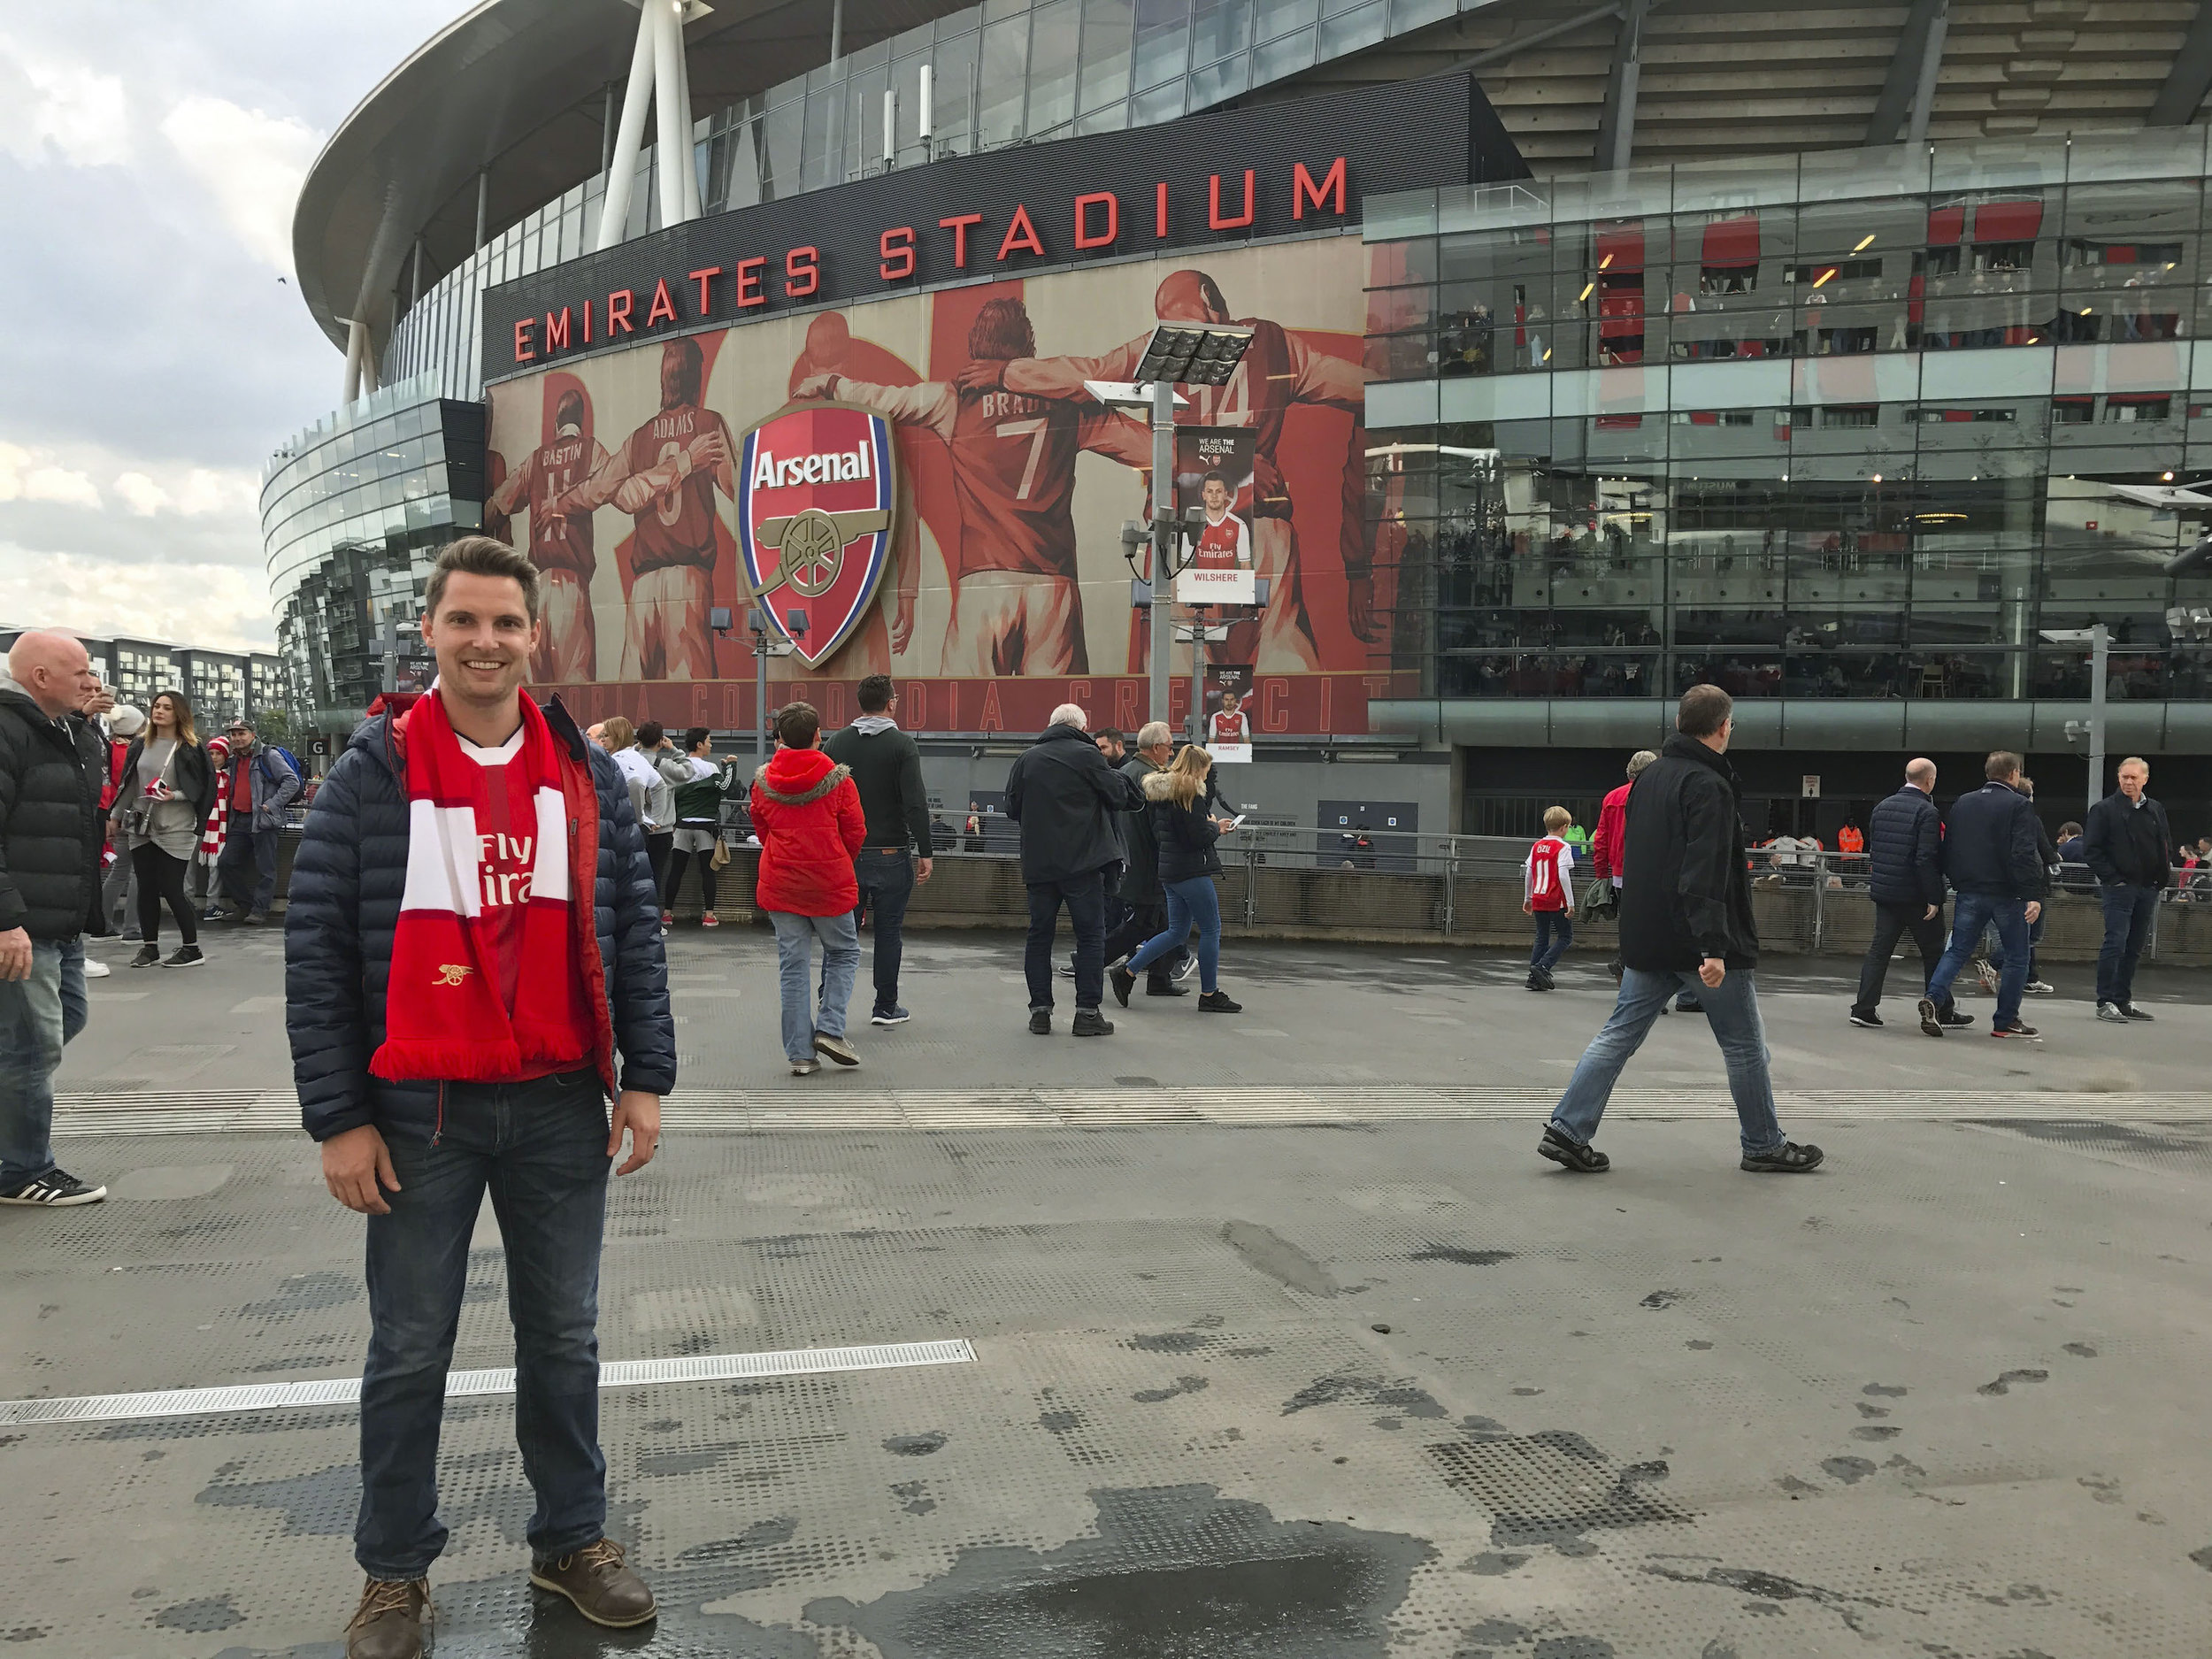 Rob outside of Emirates Stadium Pre Arsenal Match